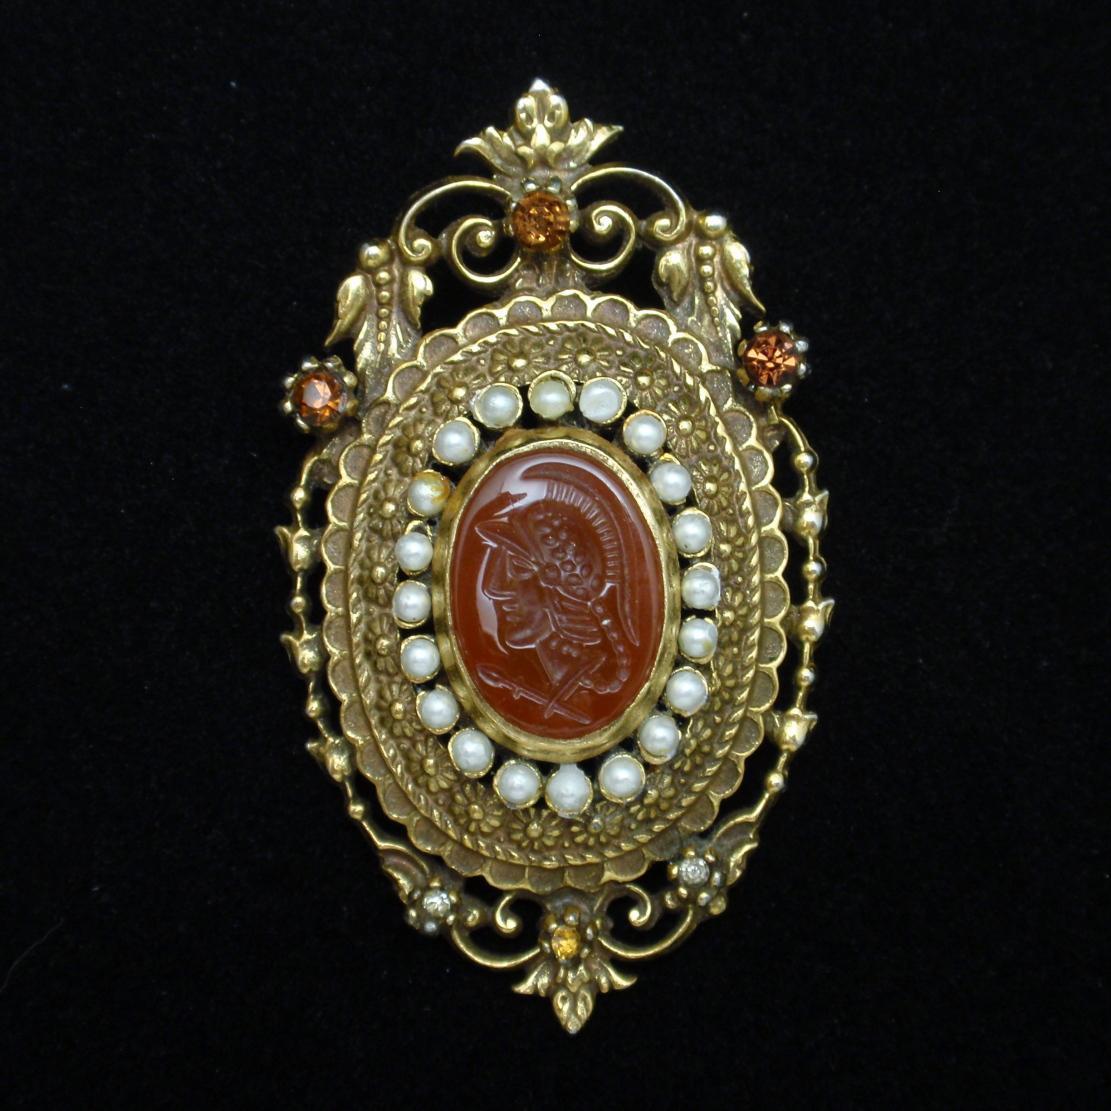 Ornate Intaglio Brooch Pin Vintage